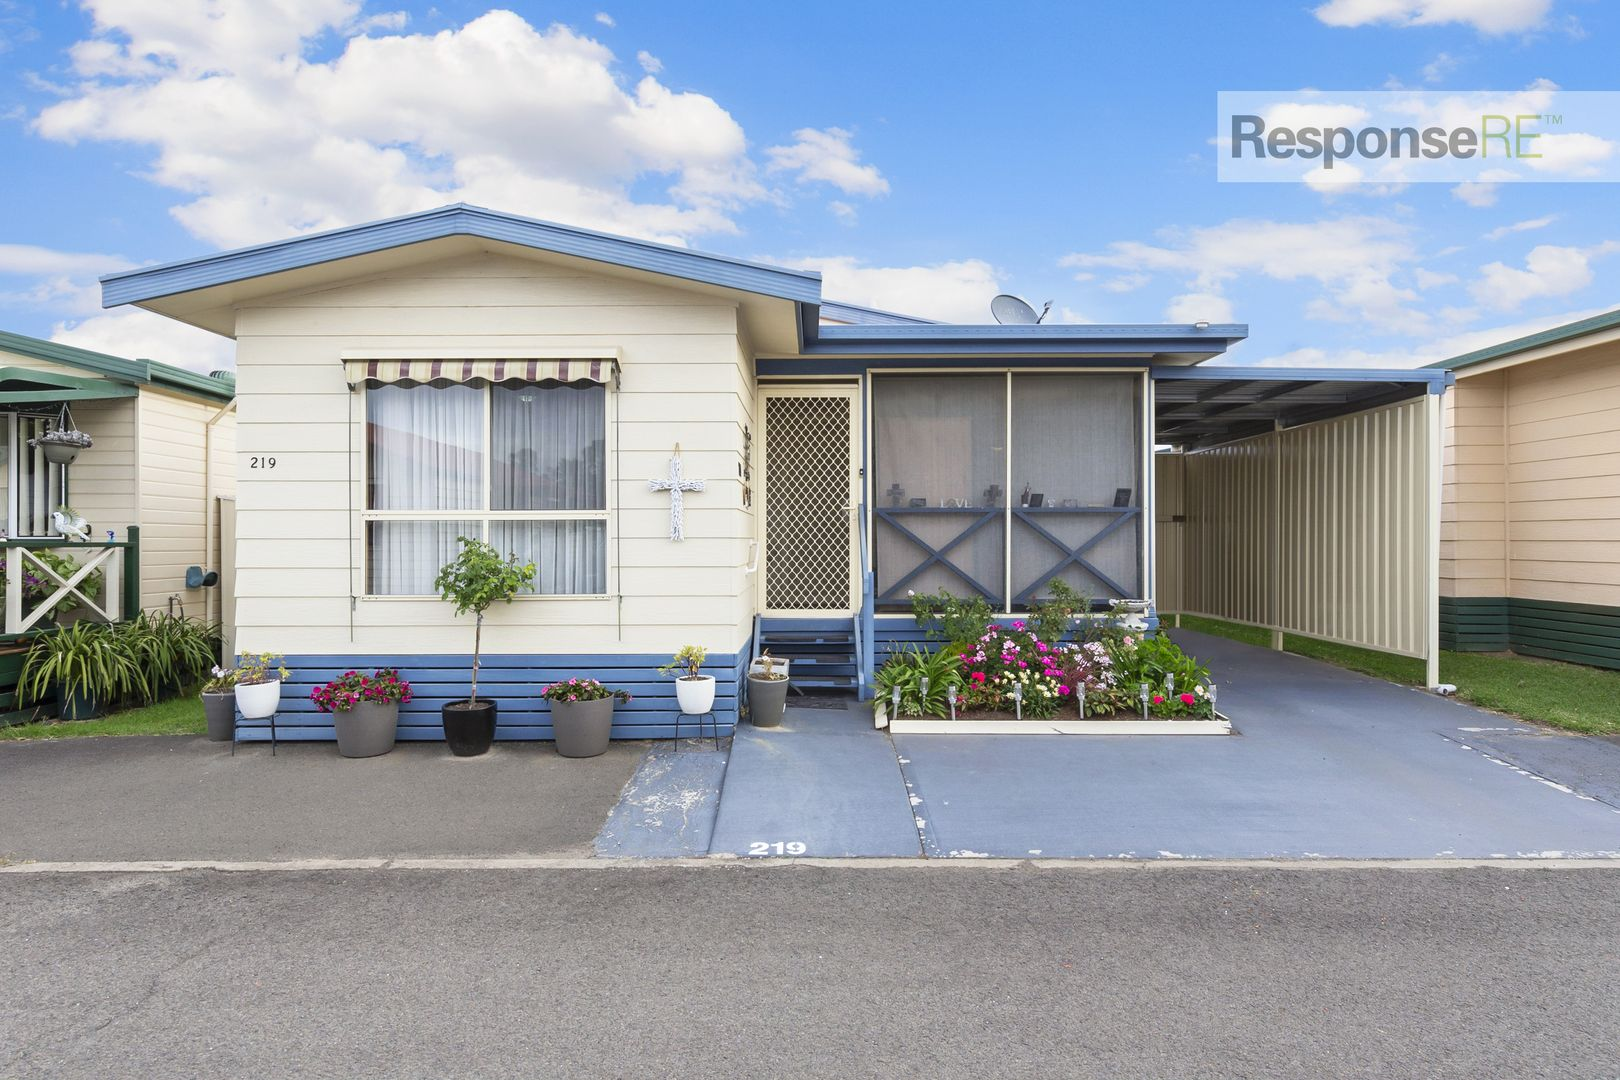 219/6-22 Tench Avenue, Jamisontown NSW 2750, Image 0